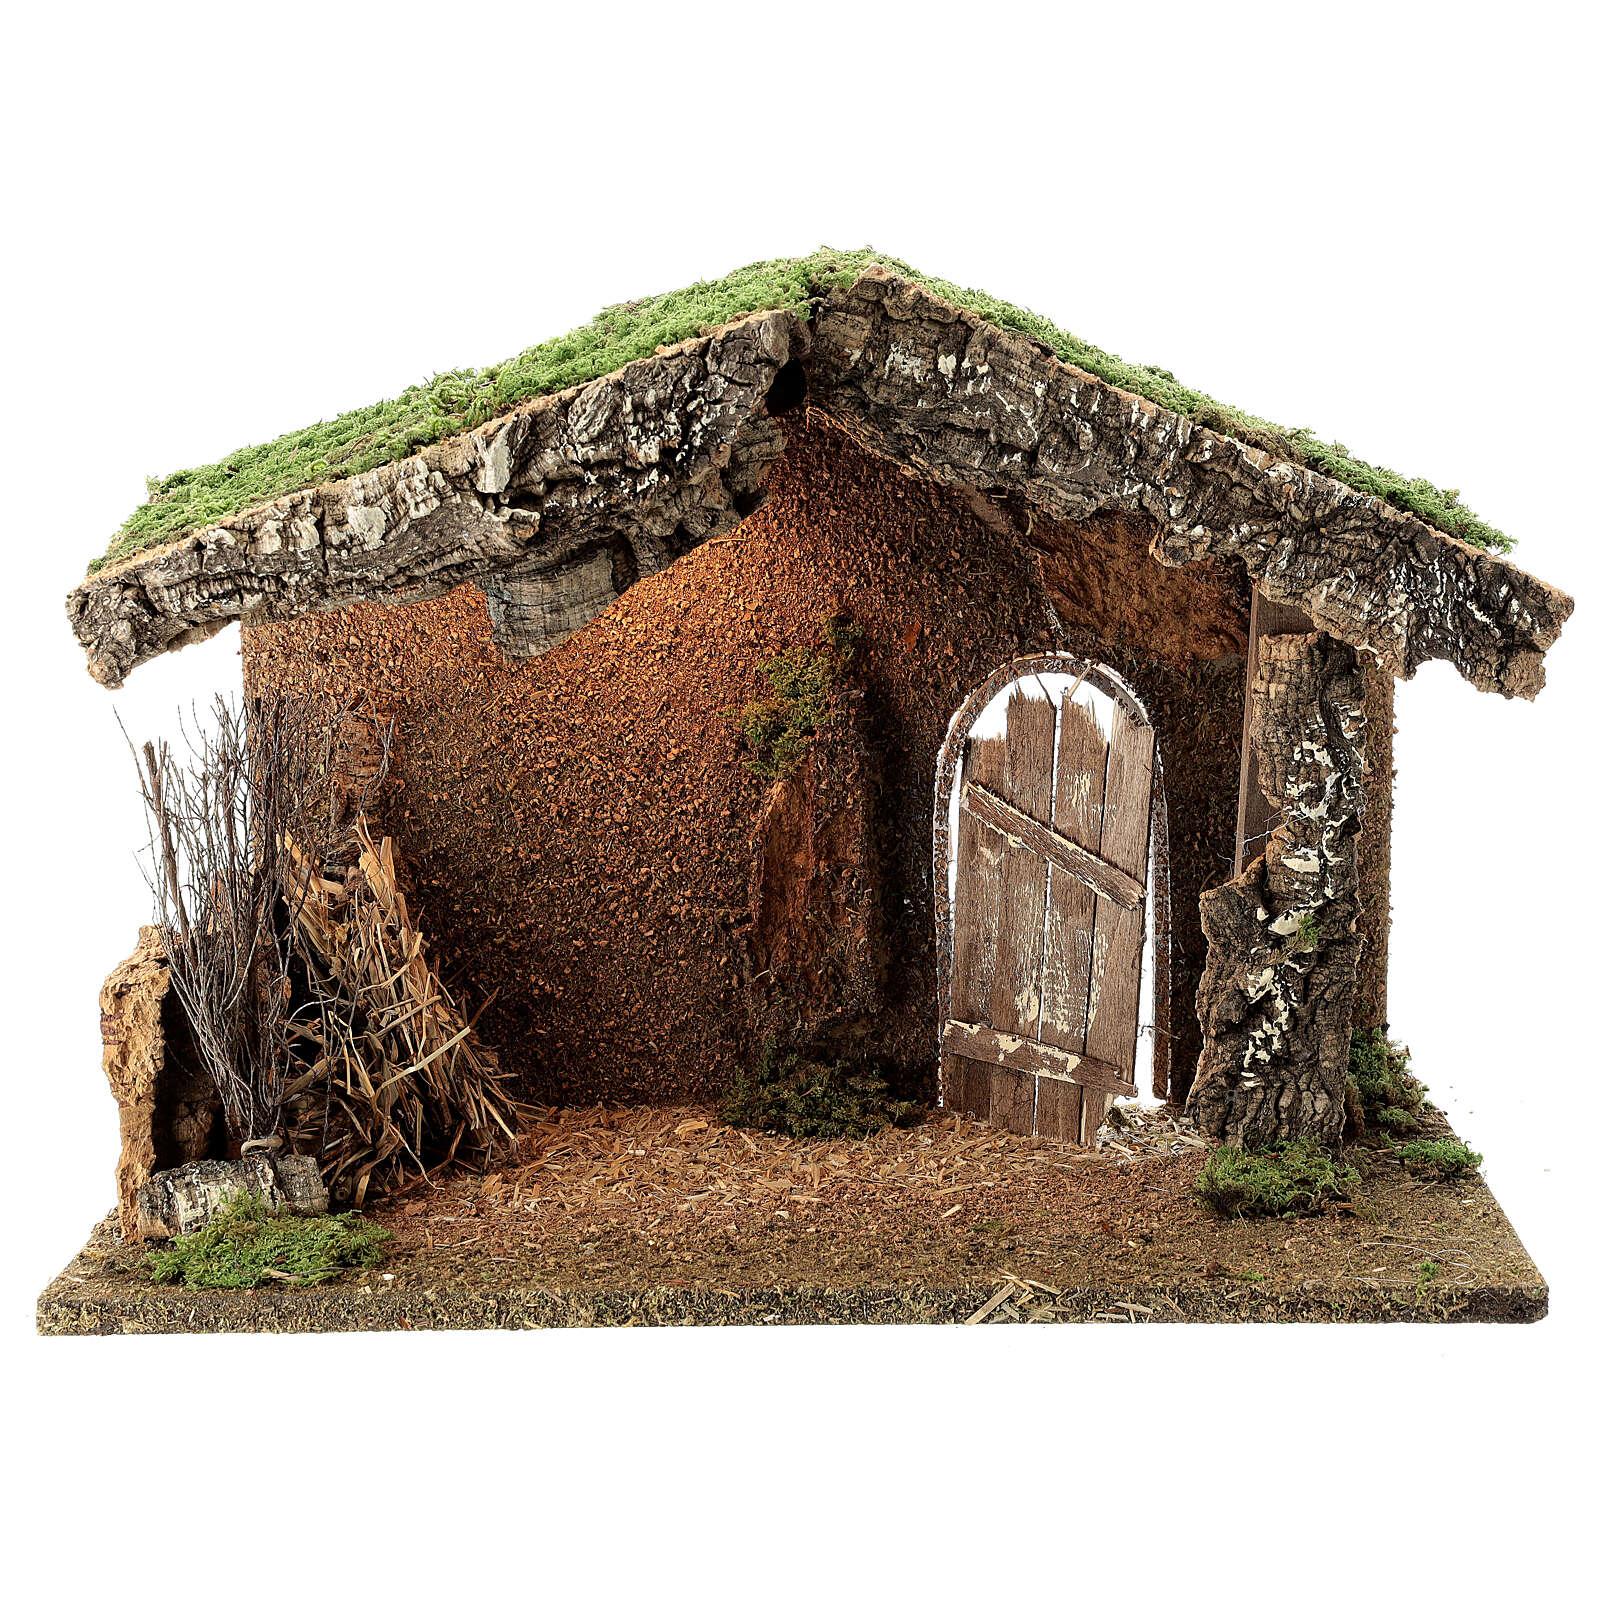 Capanna presepe rustica porta socchiusa fieno 30x40x20 statue 12-14 cm 4